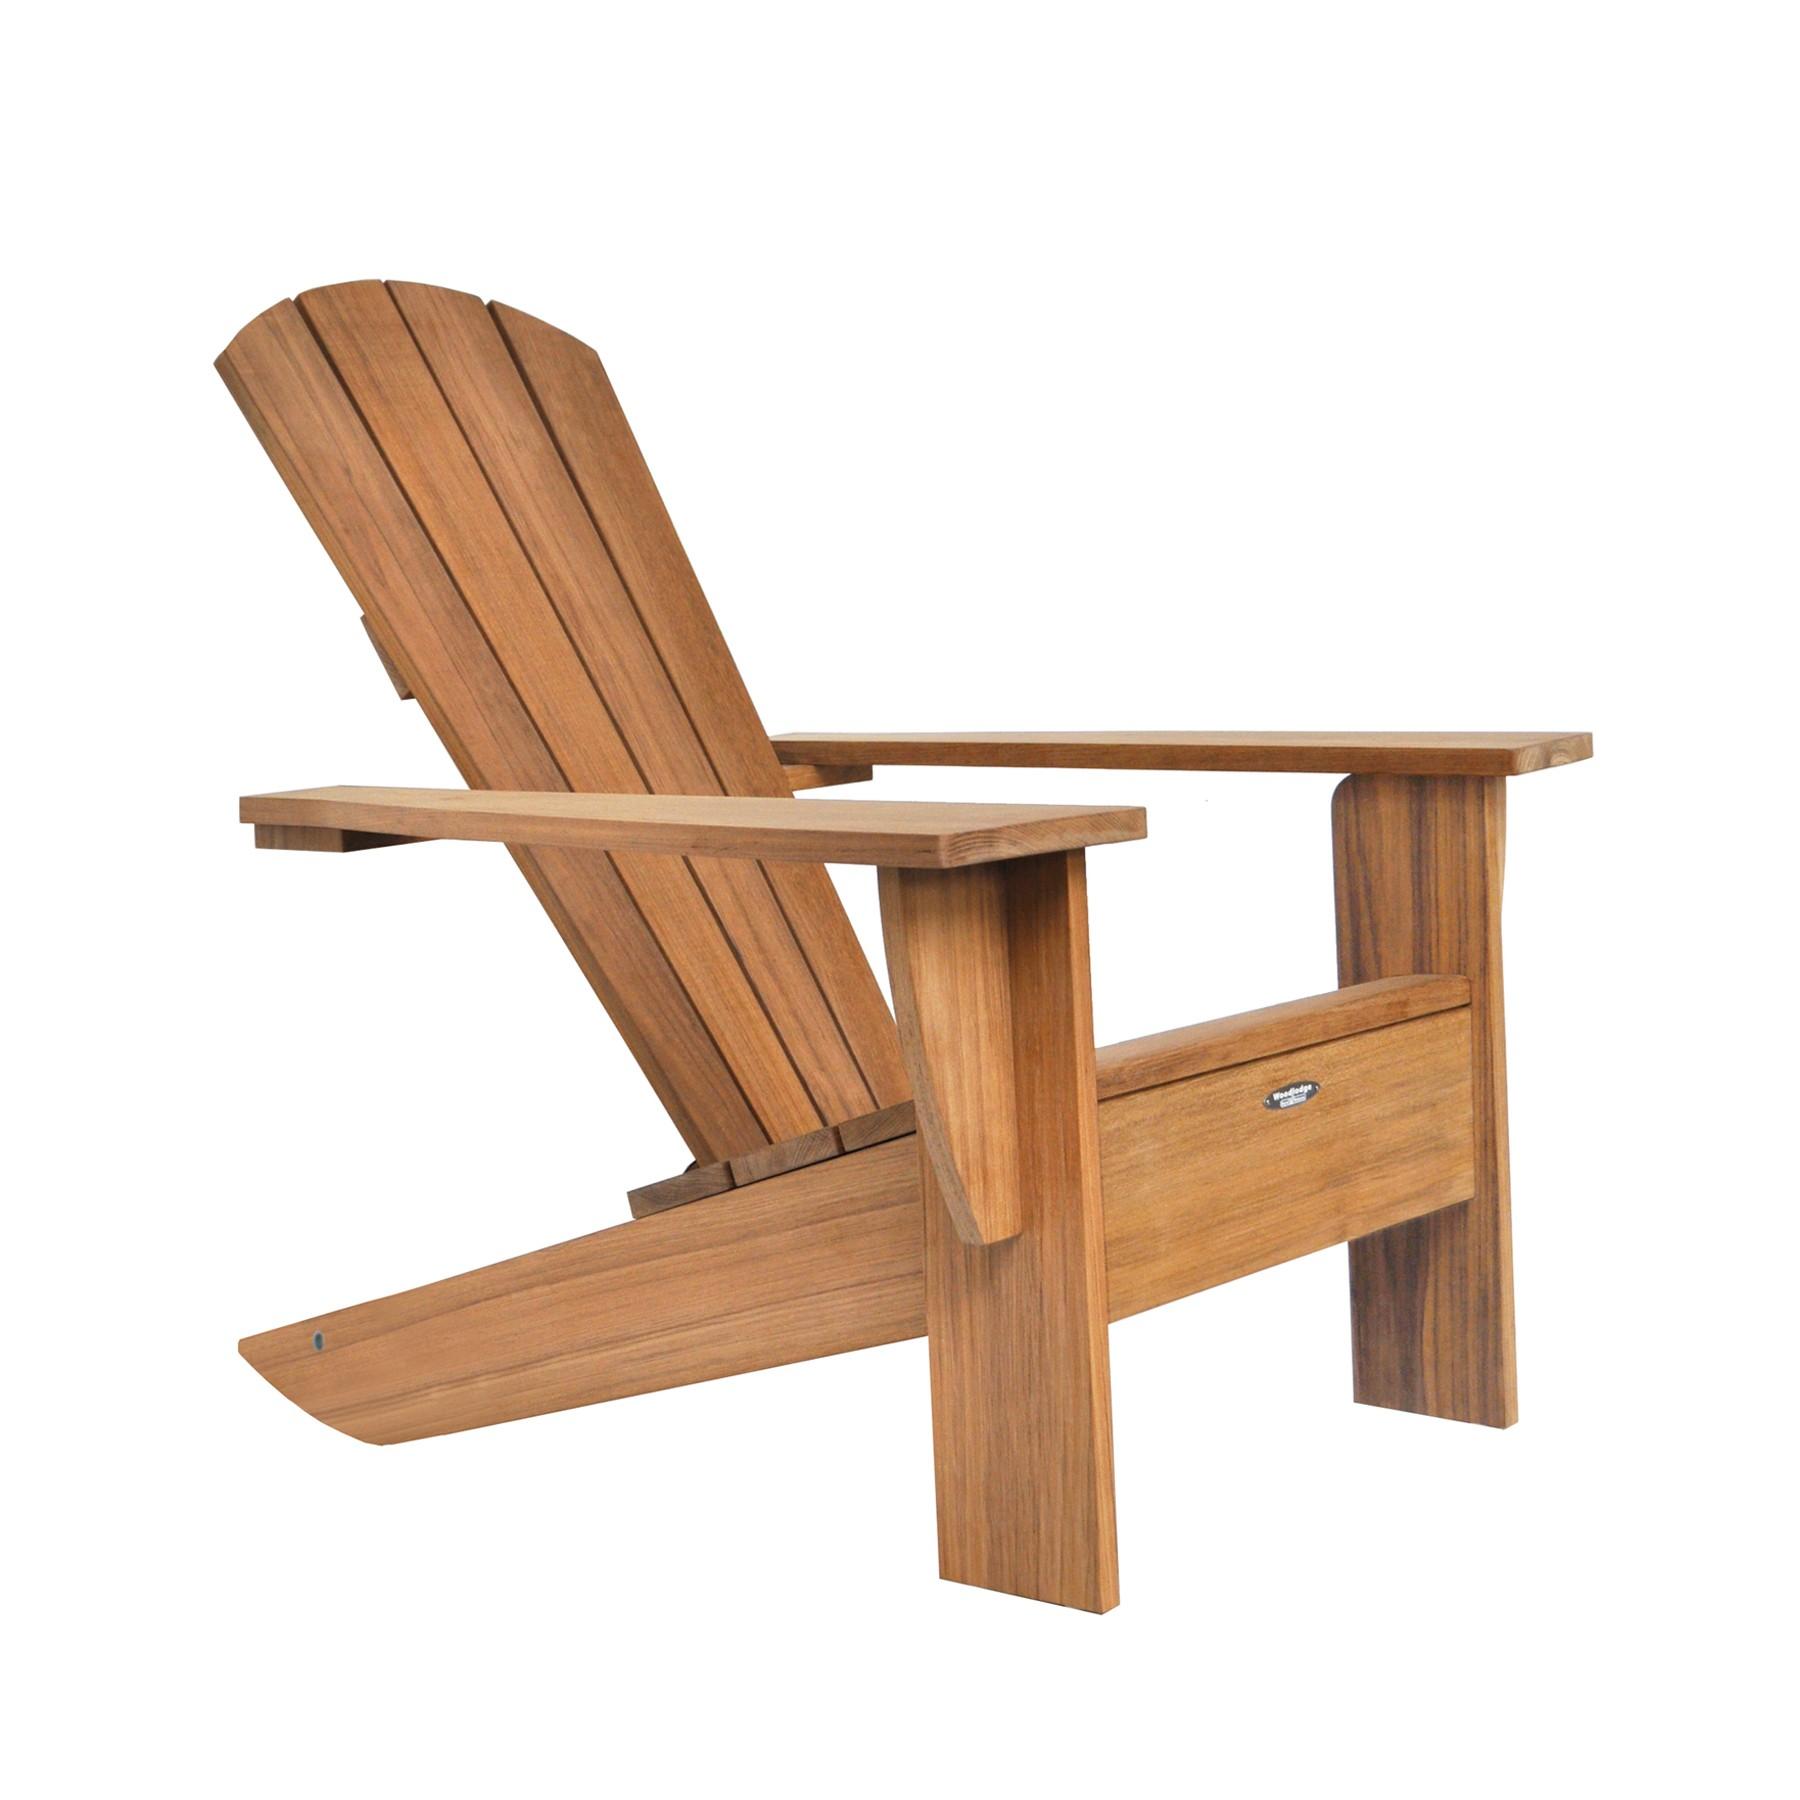 Coussin Pour Fauteuil Adirondack chaise new-england de royal botania, teck